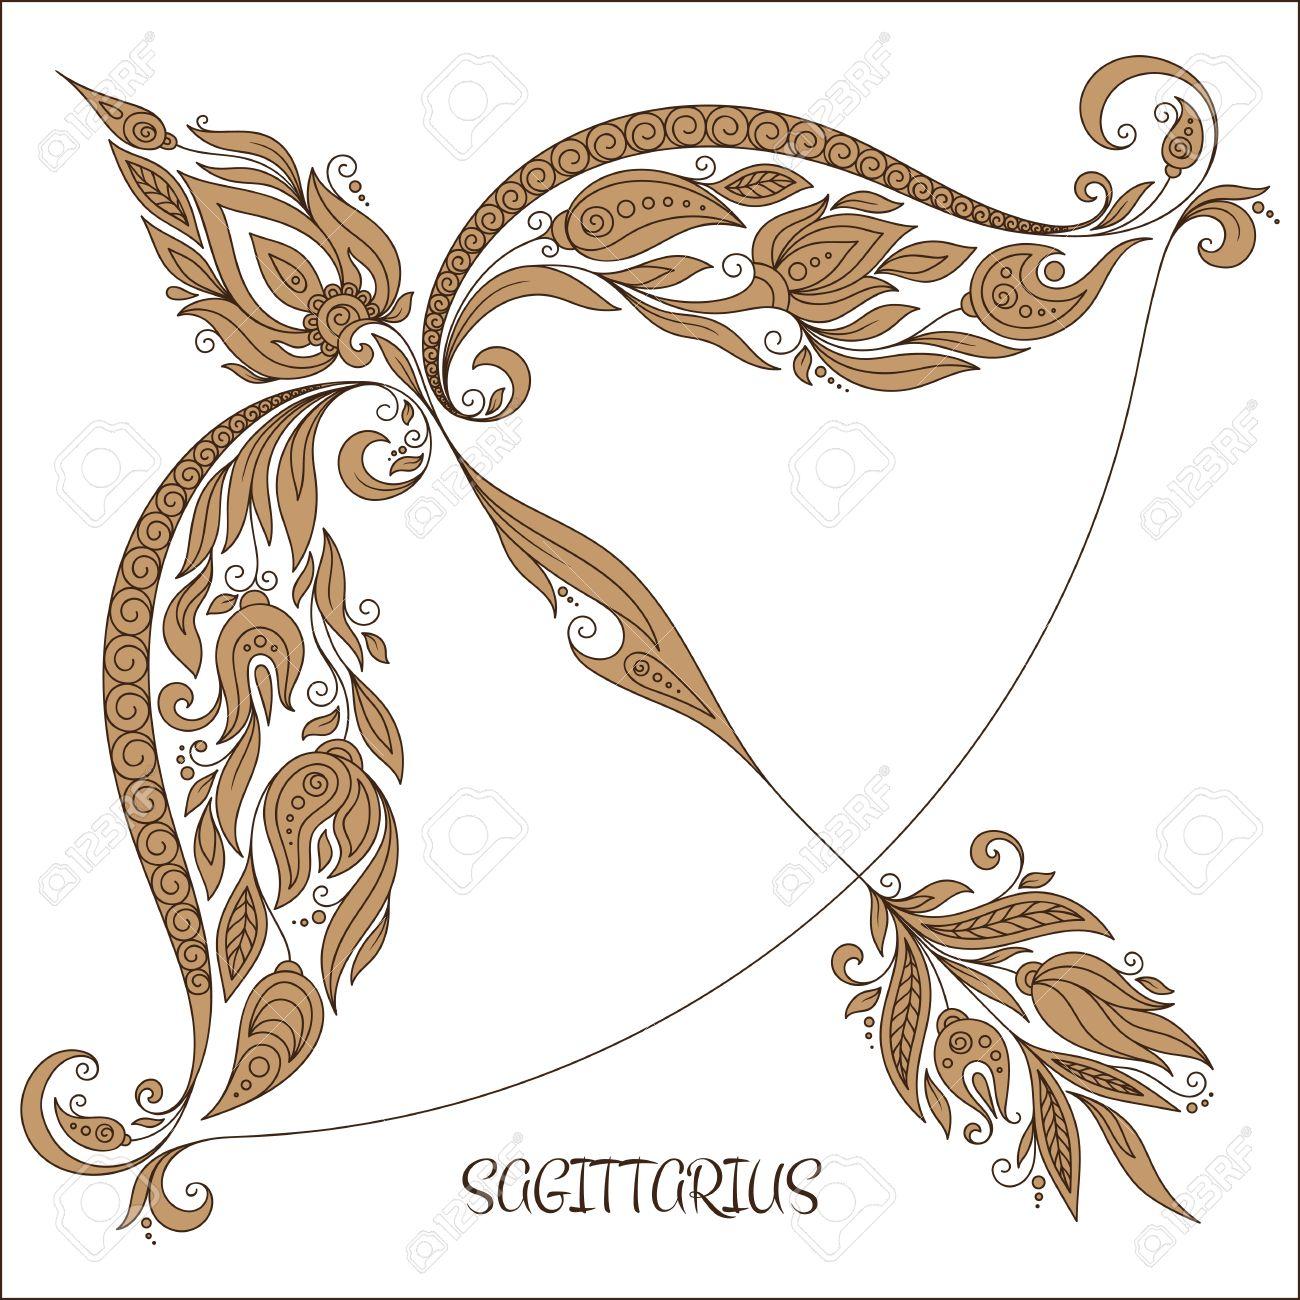 Pattern For Coloring Book Hand Drawn Line Flowers Art Of Zodiac Sagittarius Horoscope Symbol